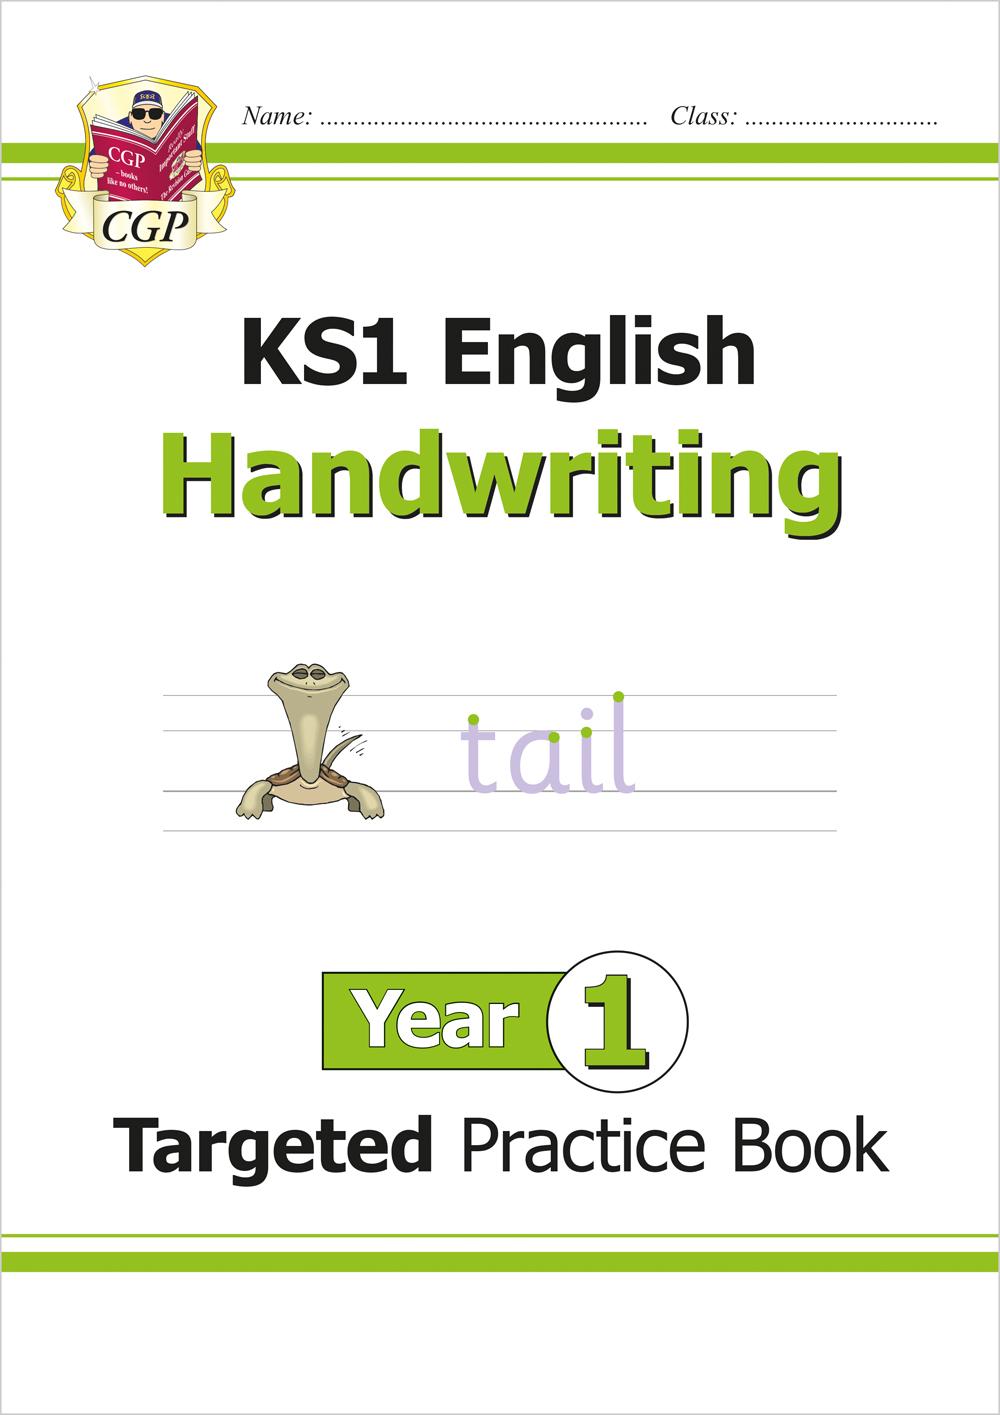 ks2 english targeted practice book handwriting year 4 cgp books. Black Bedroom Furniture Sets. Home Design Ideas